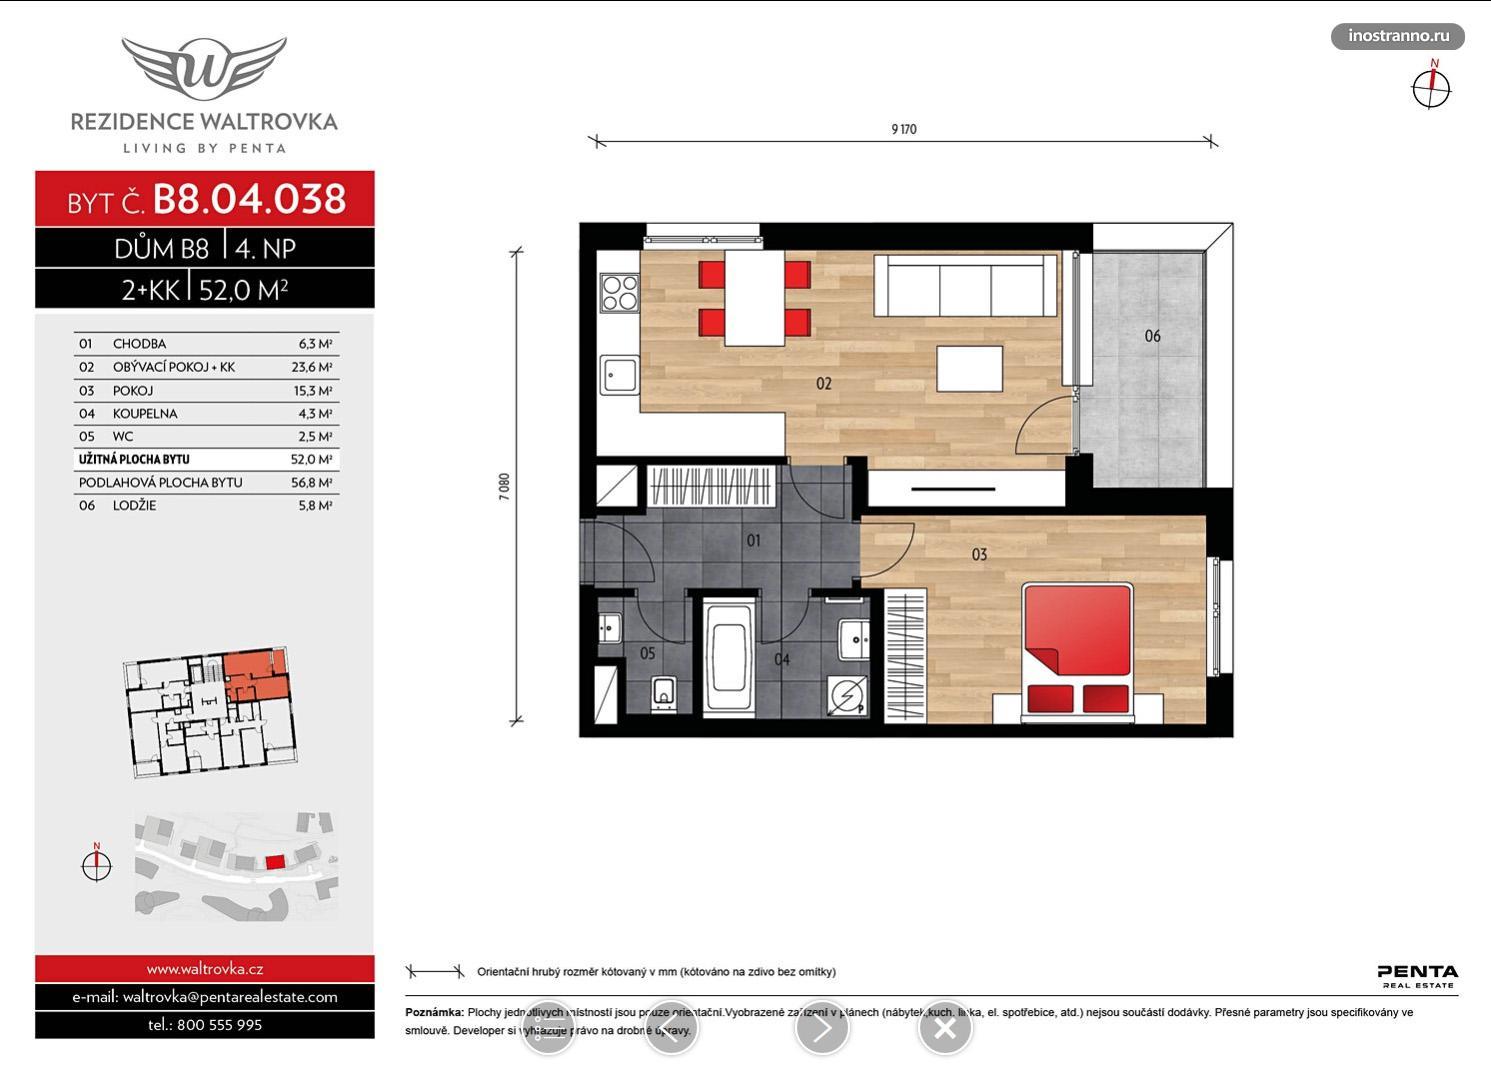 Новостройка Резиденция Валтровка в Праге план квартиры и цена